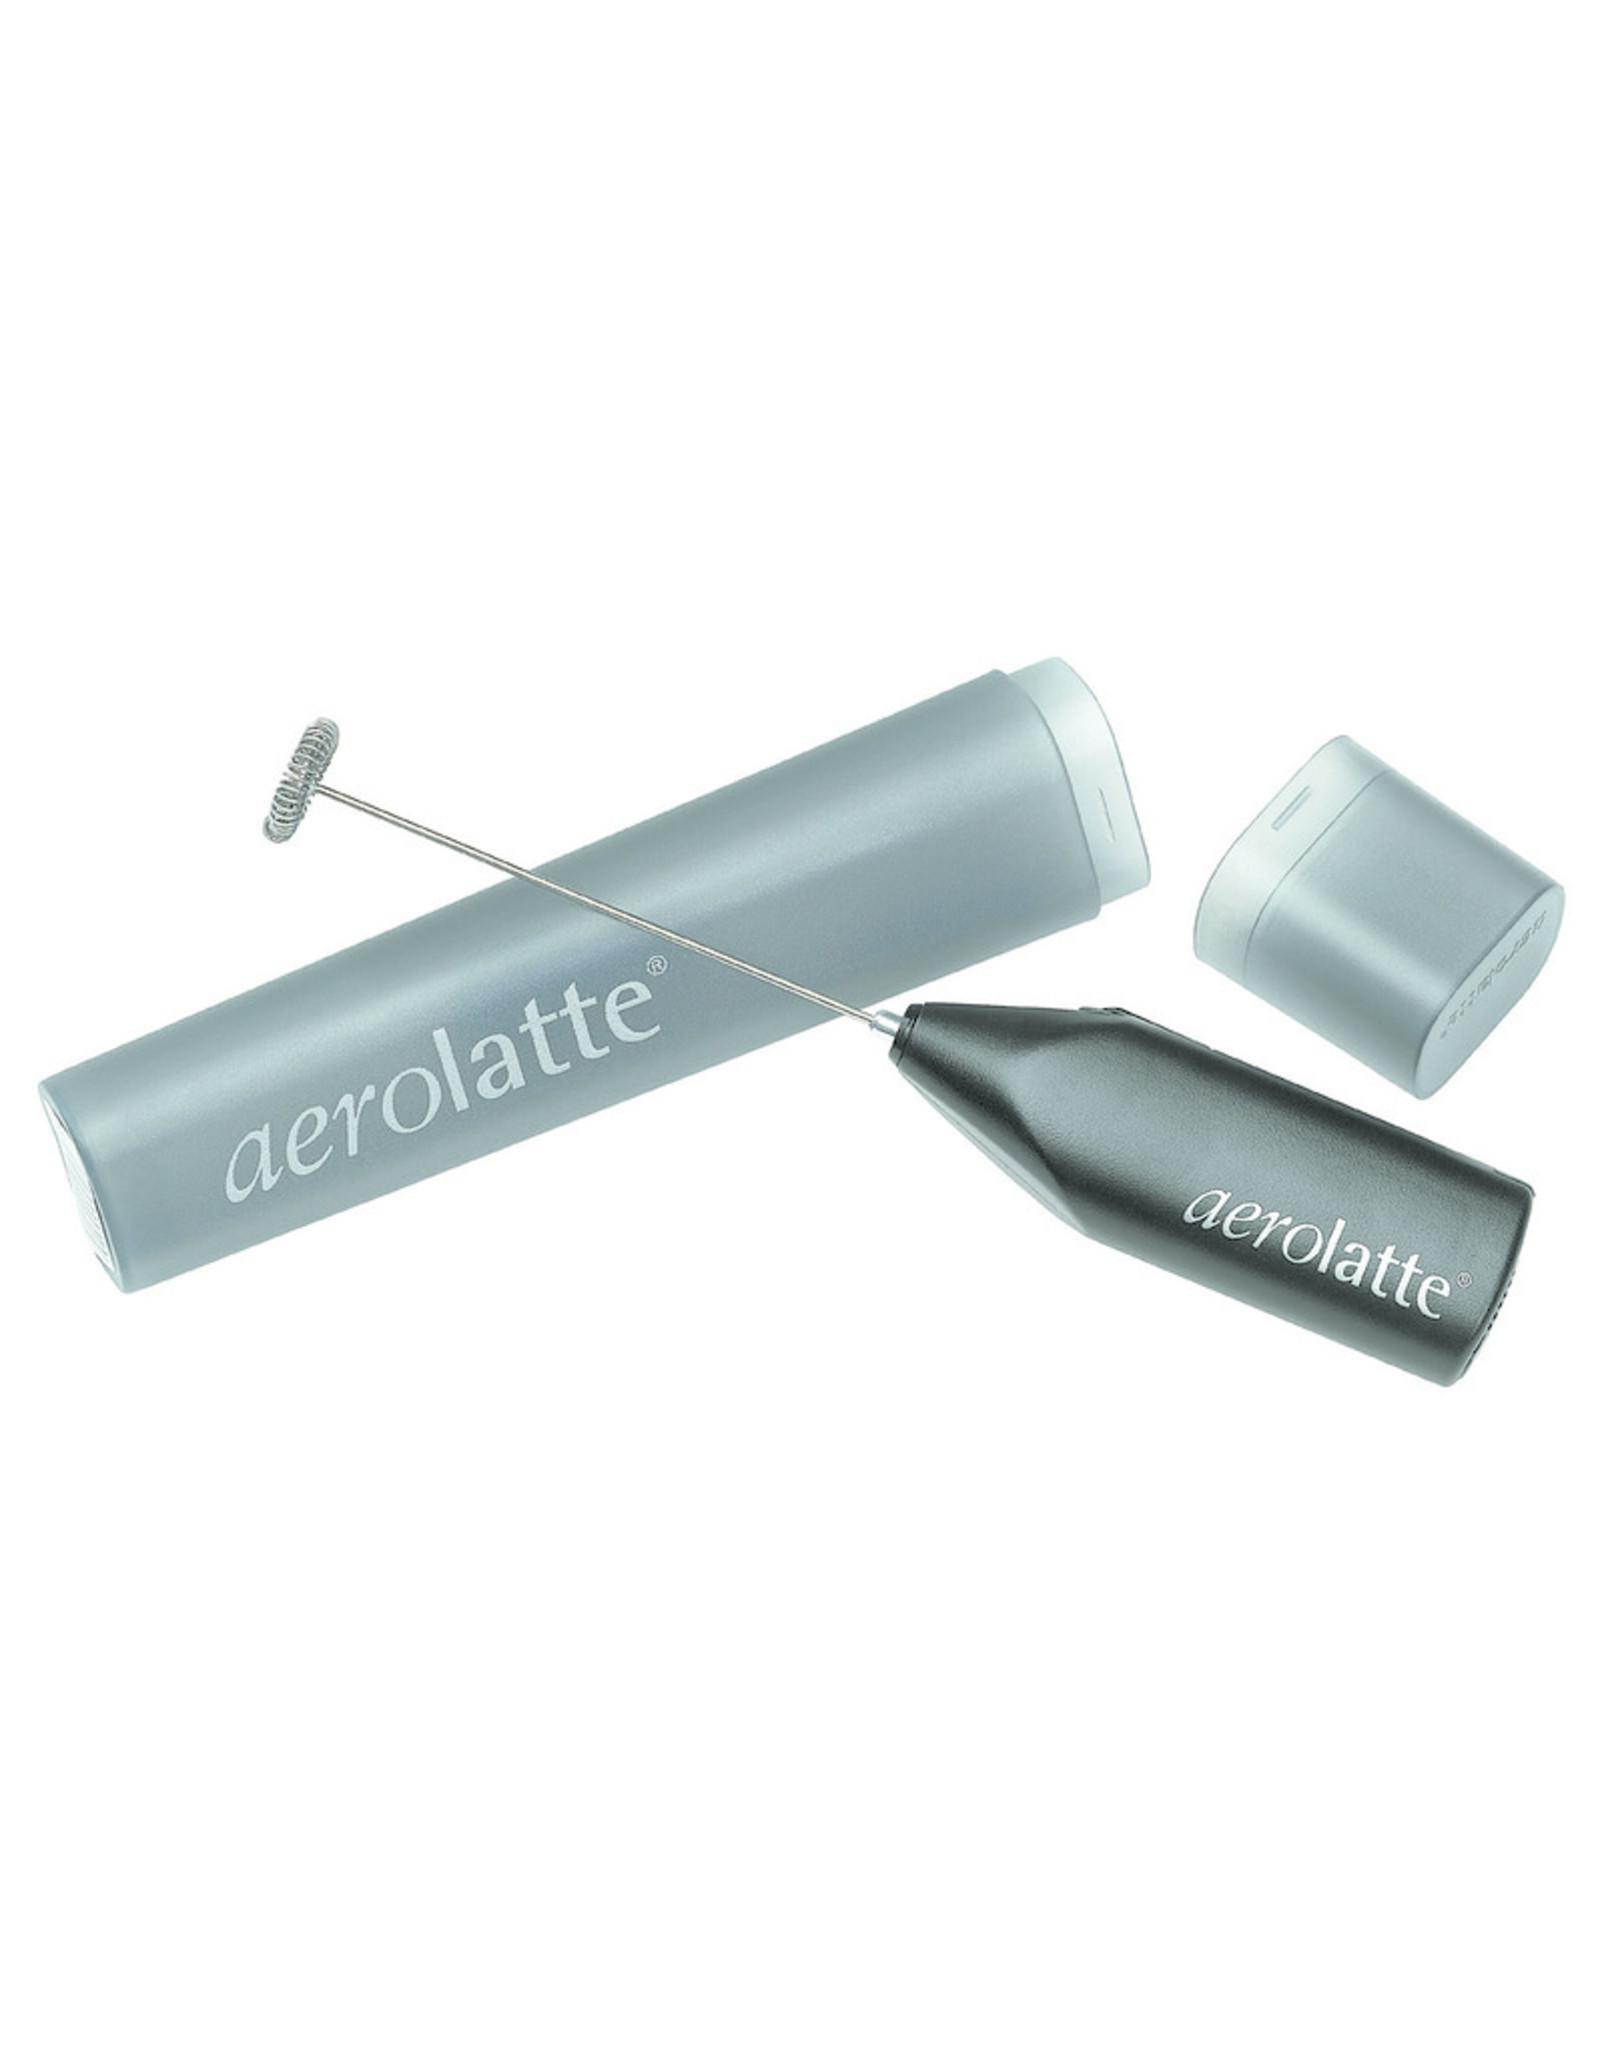 Aerolatte Melkopschuimer Aerolatte 'To Go' Aerolatte